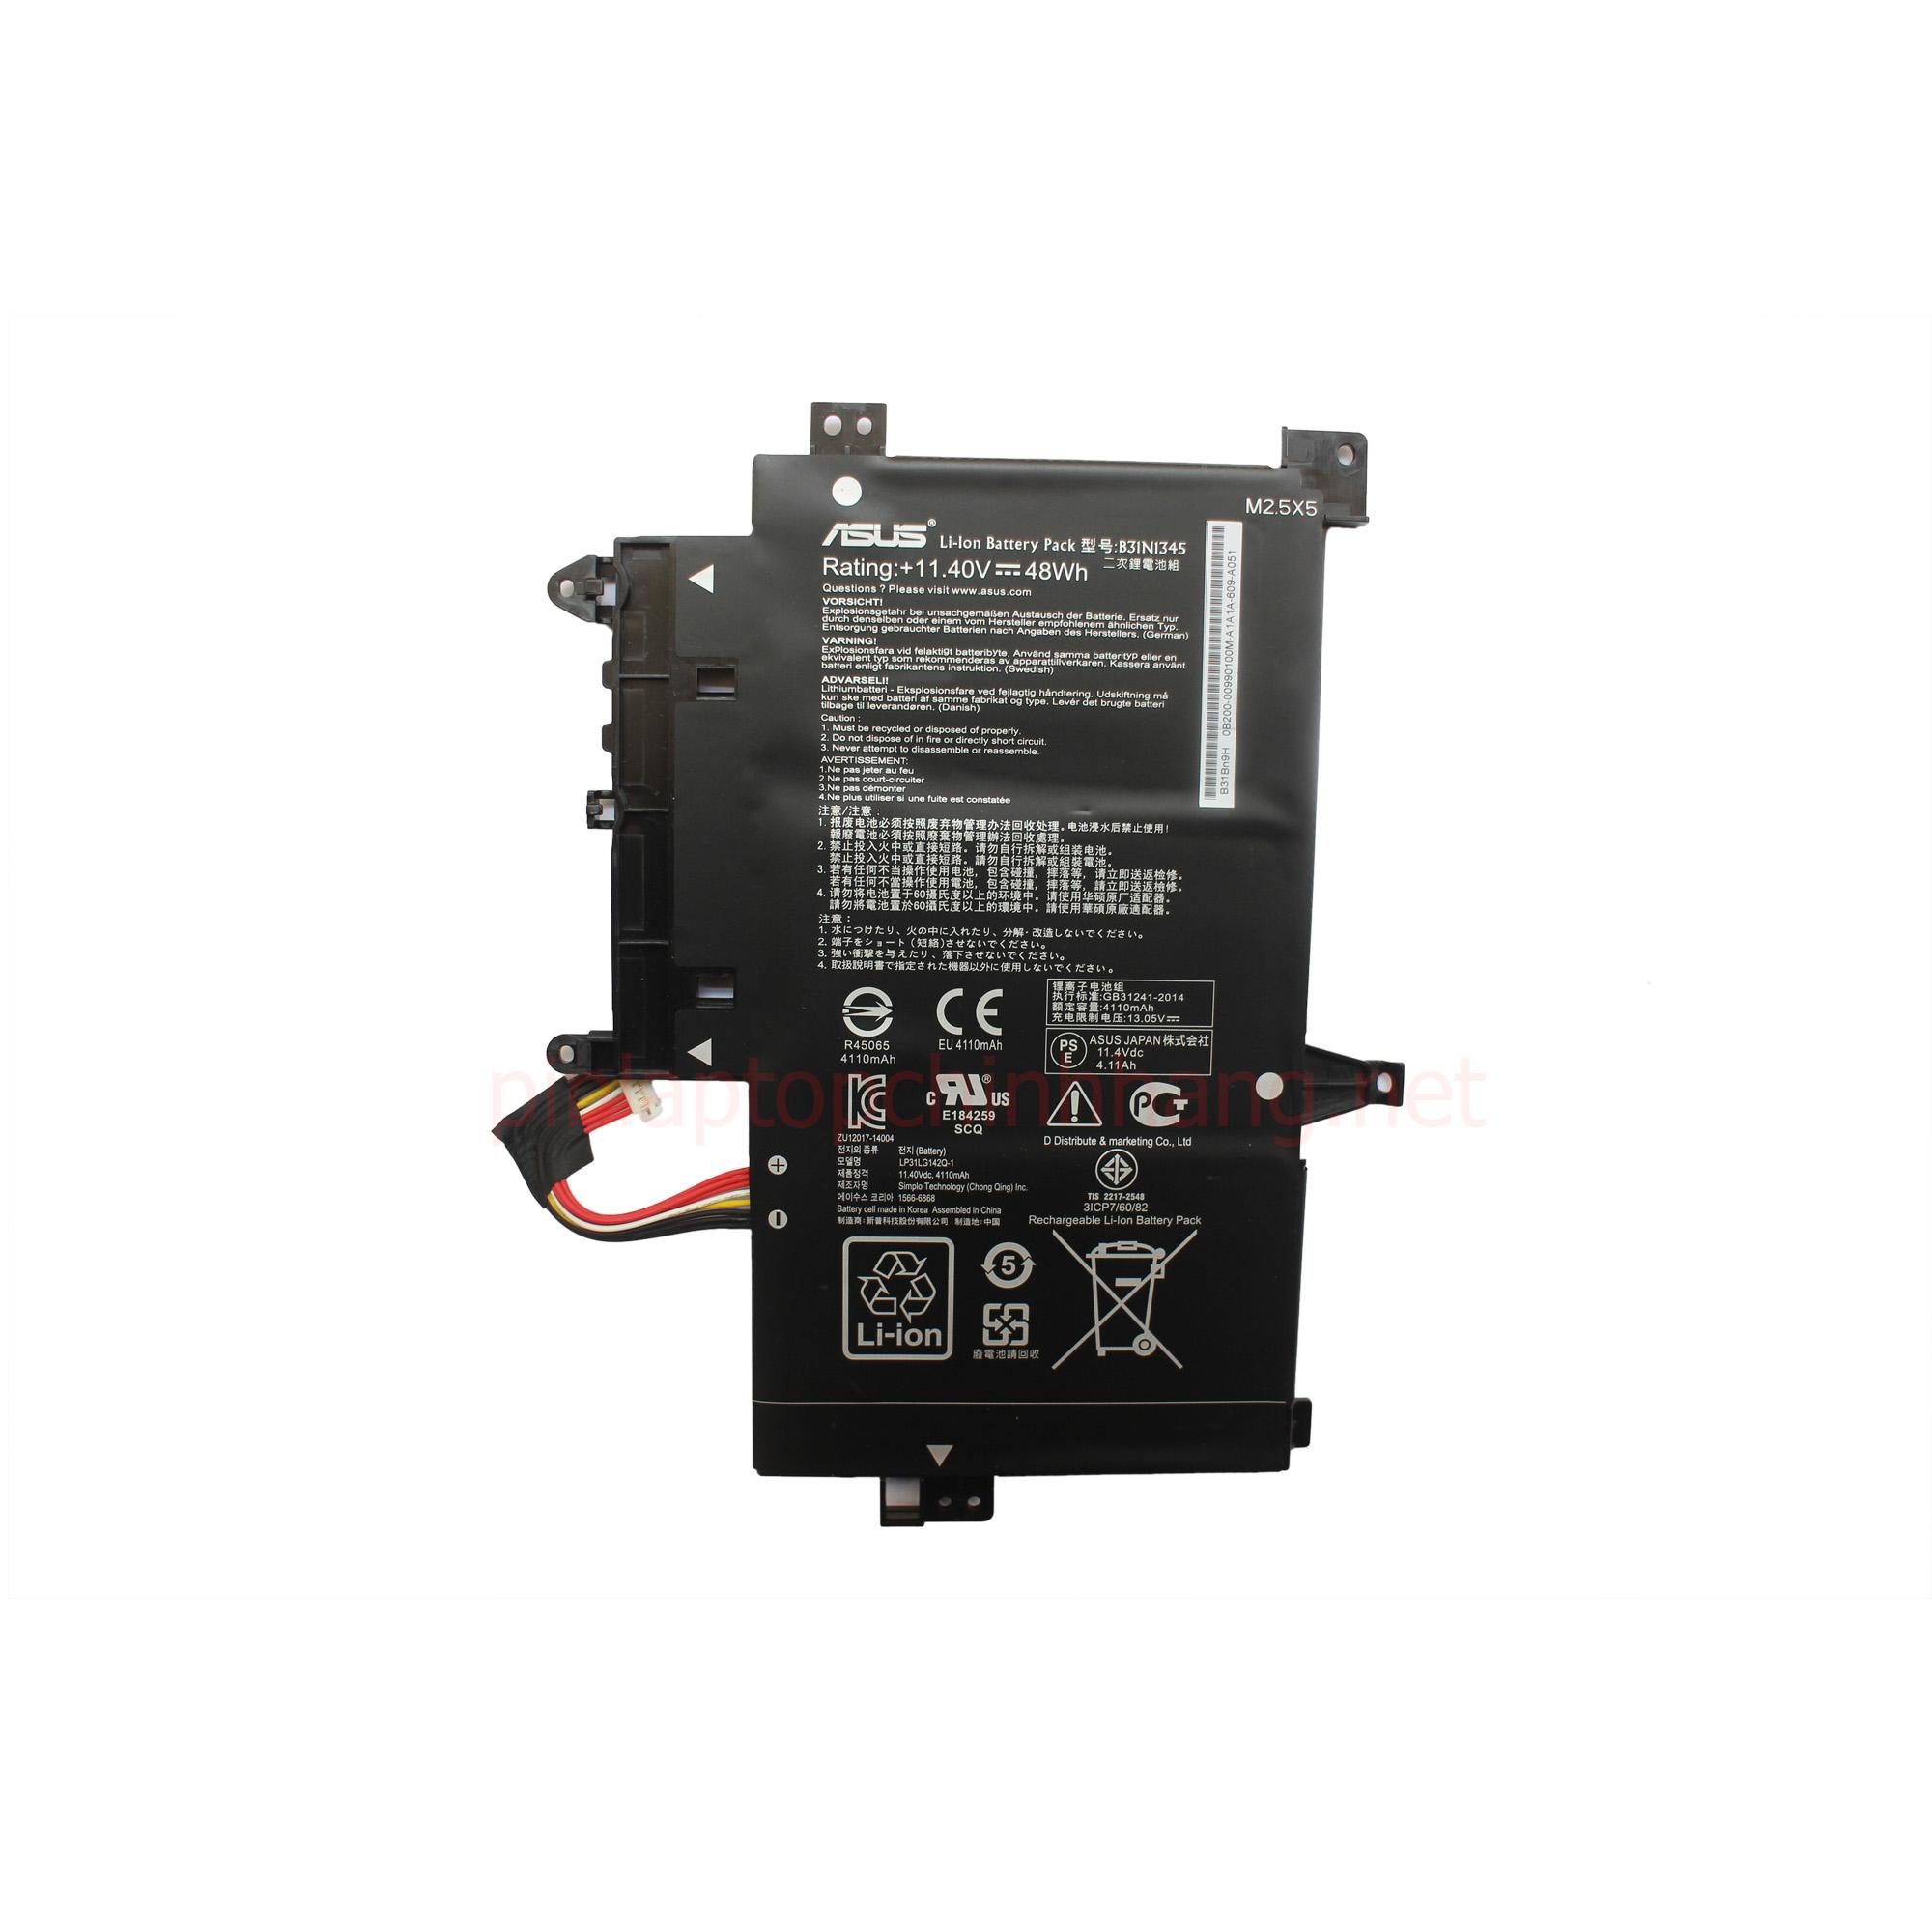 Battery Pin Laptop Chính Hãng Asus TP500 TP500L TP500LA TP500LN TP500LB B31N1345